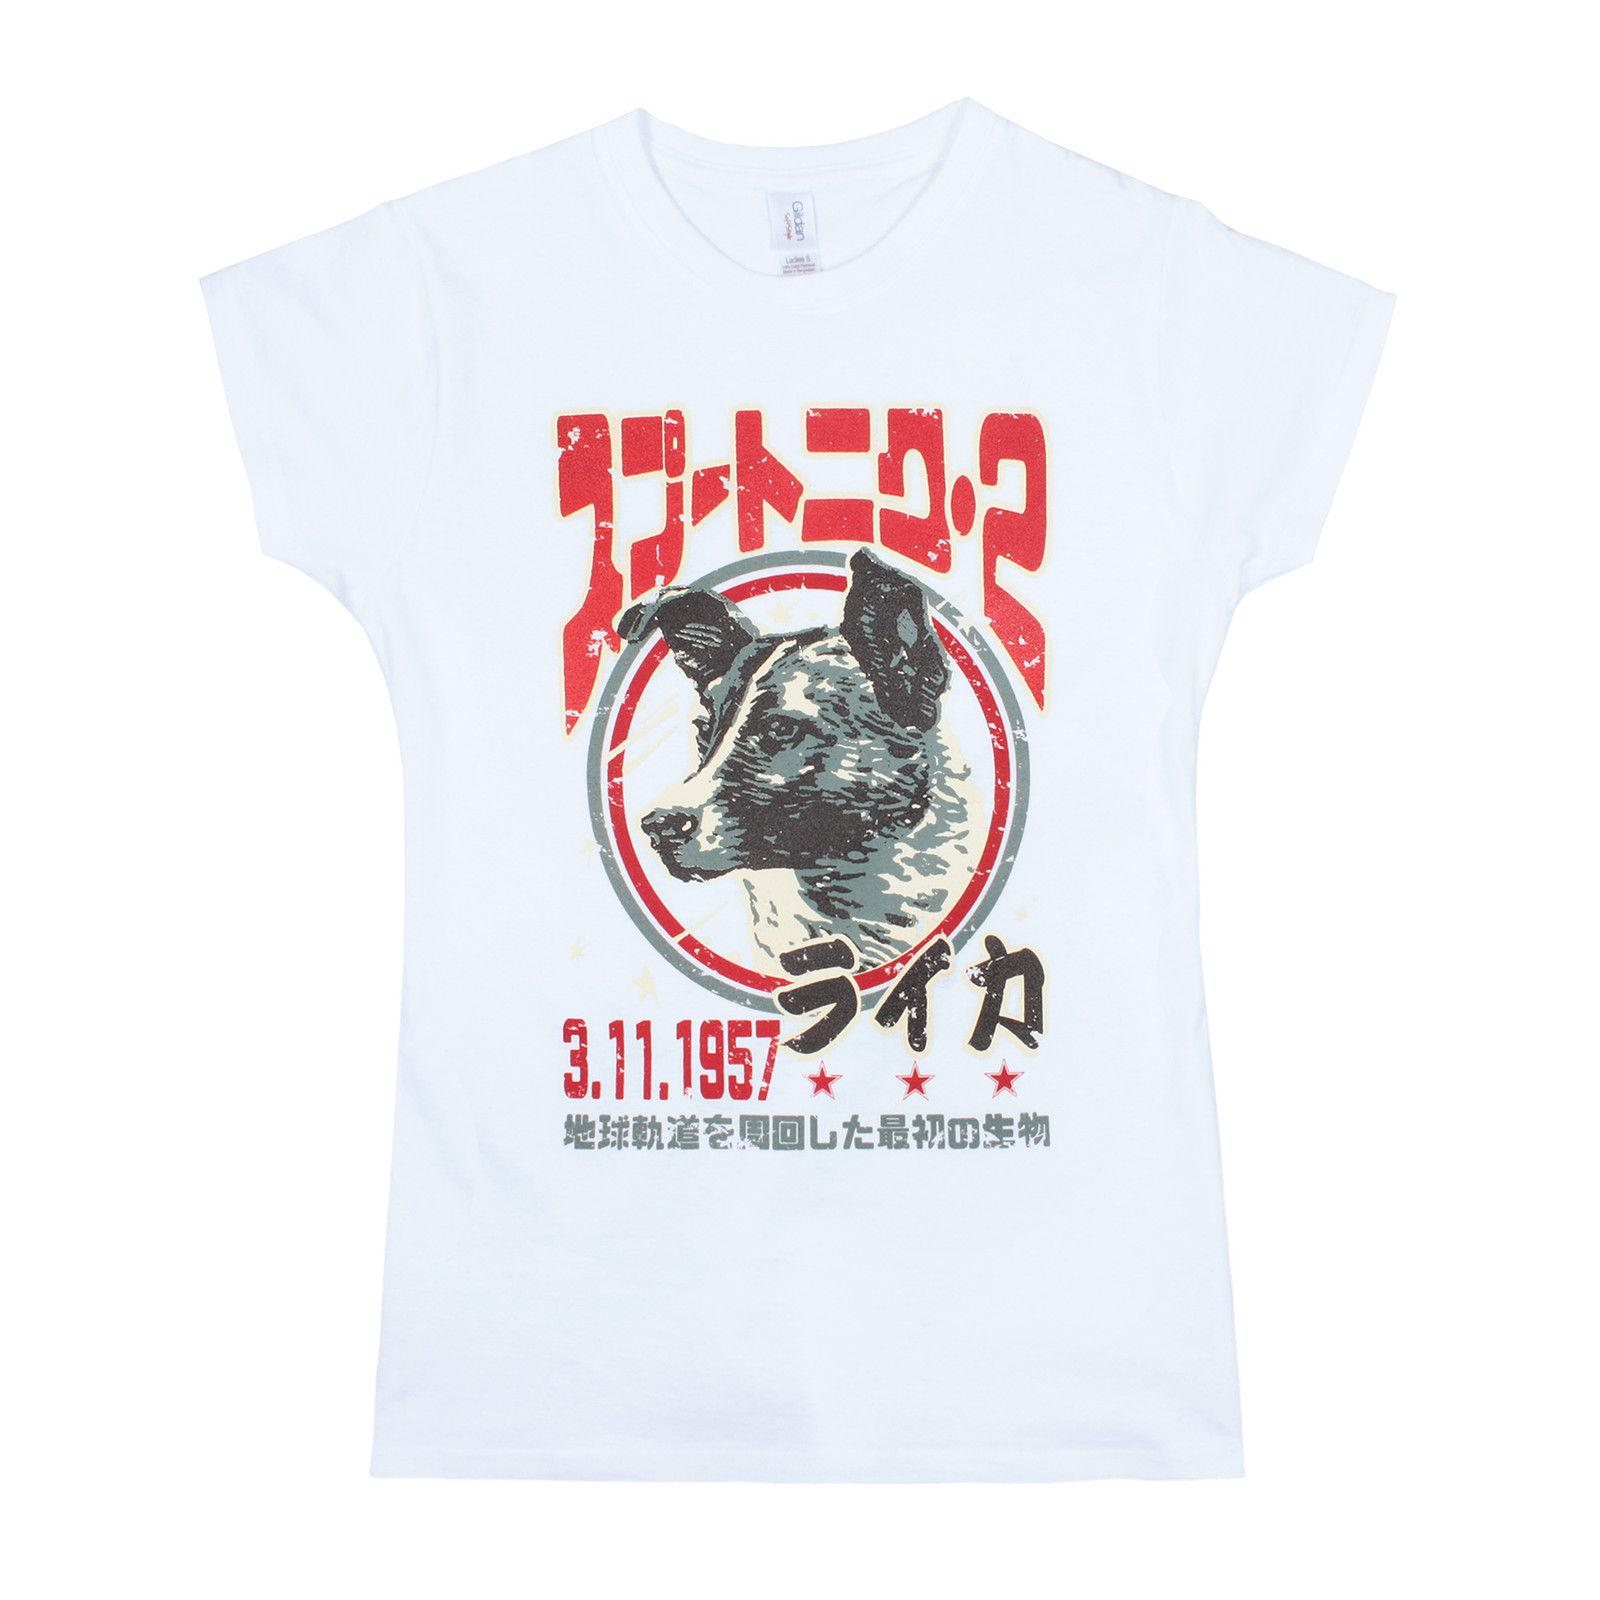 efd203cd Laika The Space Dog T Shirt Japanese Womens Cattt Windbreaker Pug Tshirt  Trump Sweat Sporter T Shirt Fan Pants T Shirt Crazy T Shirt T Shir From  Appcup, ...